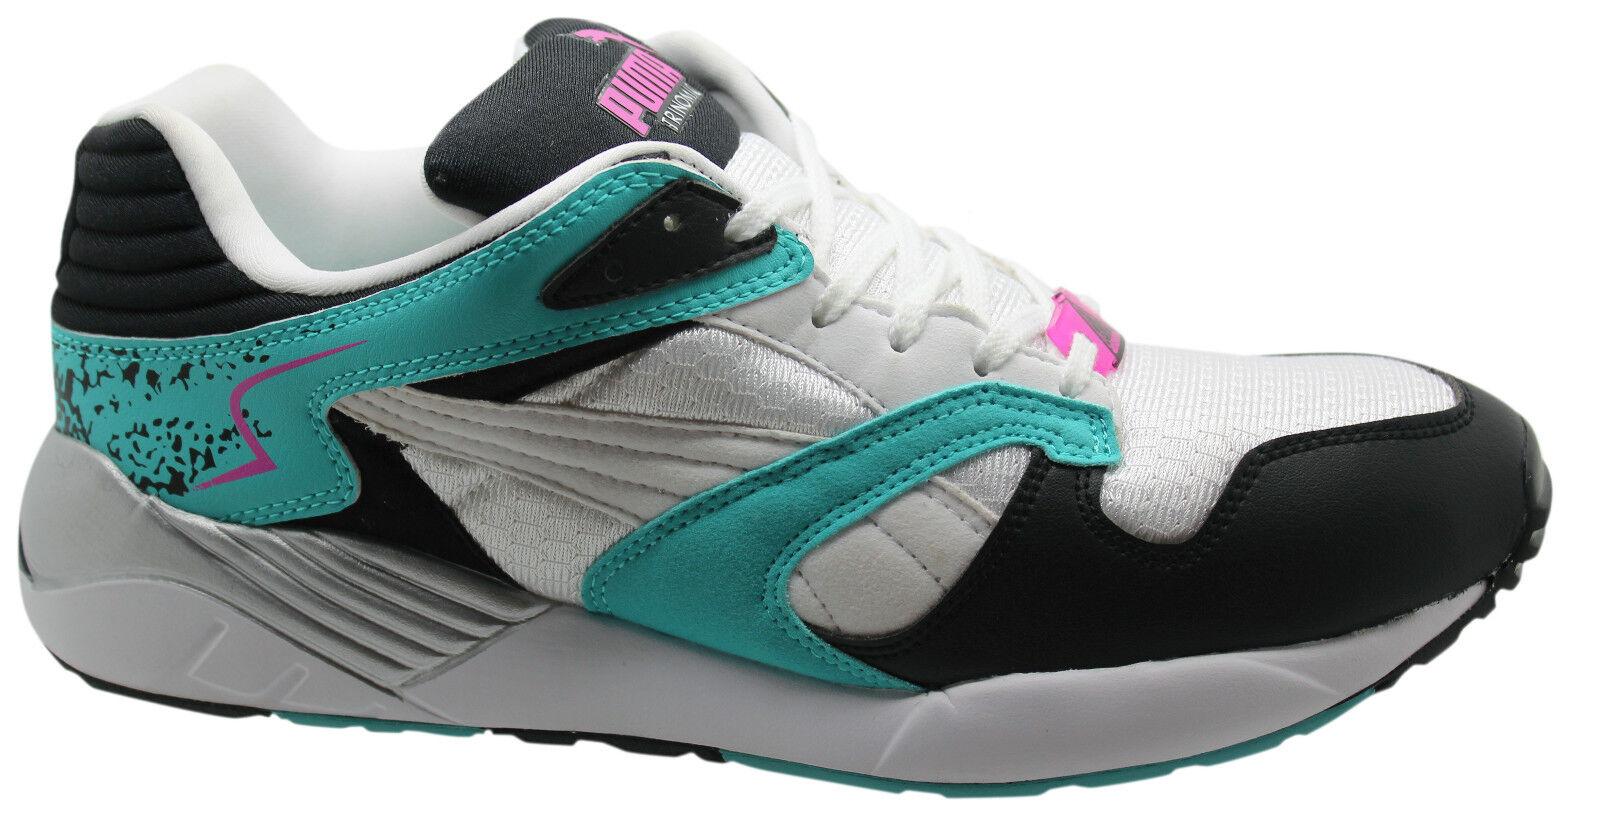 Puma Trinomic XS 850 Plus Herren Turnschuhe Schnürschuhe weiß 356143 04 D109